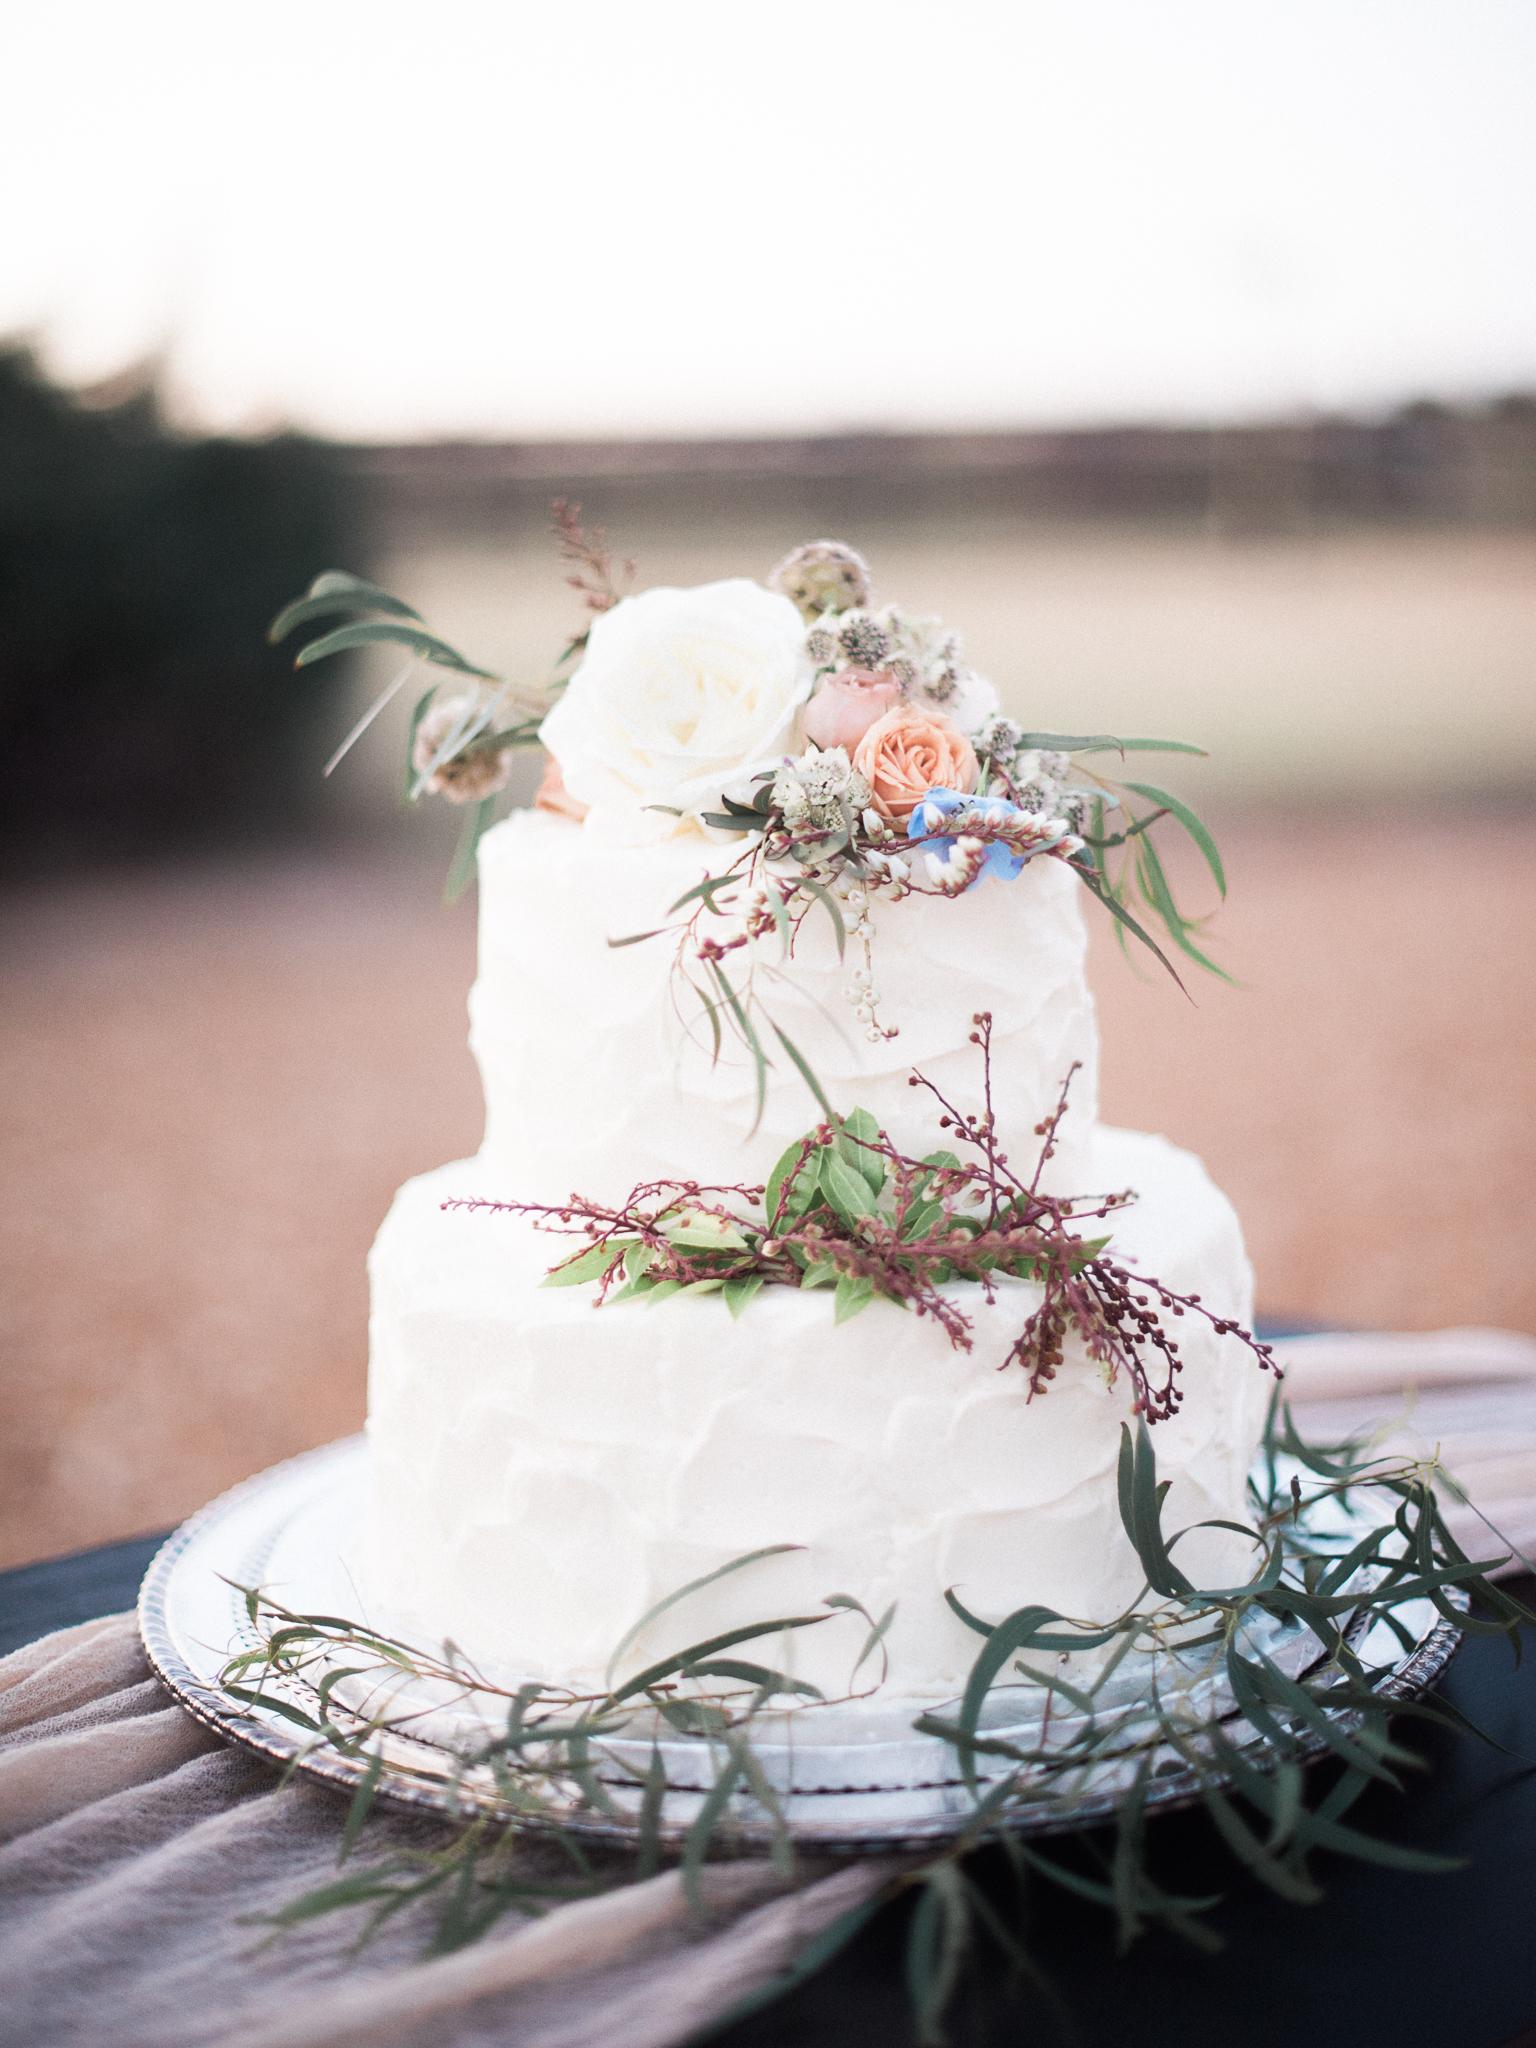 christinadavis+weddinginspiration05.jpg